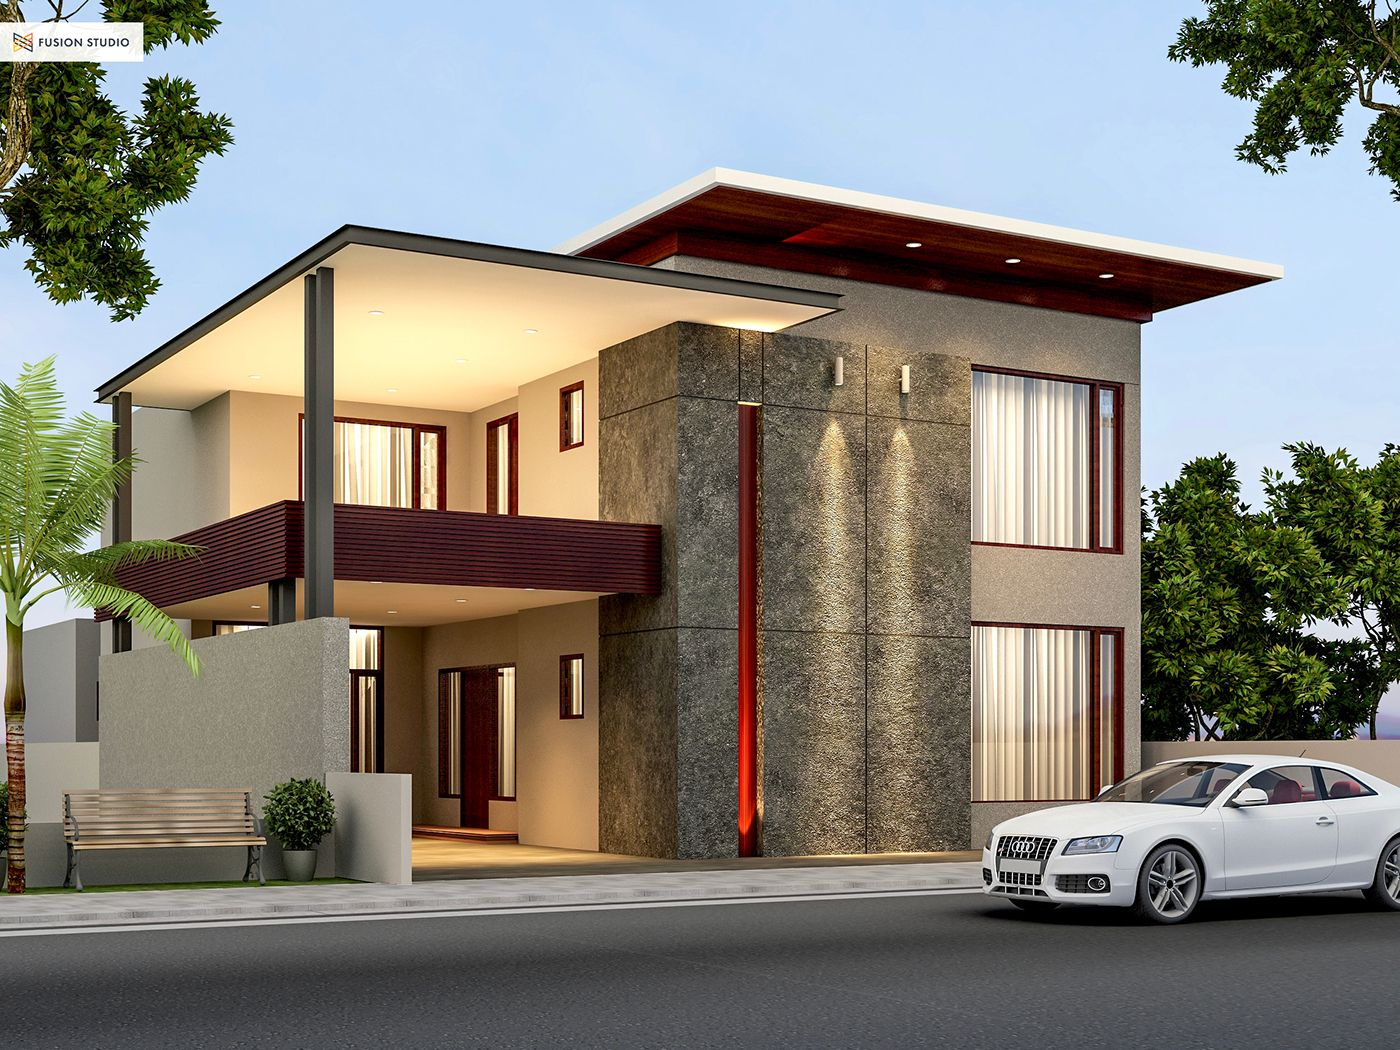 500 Yards House Elevation on Behance | DISEÑOS CASAS | Pinterest ...